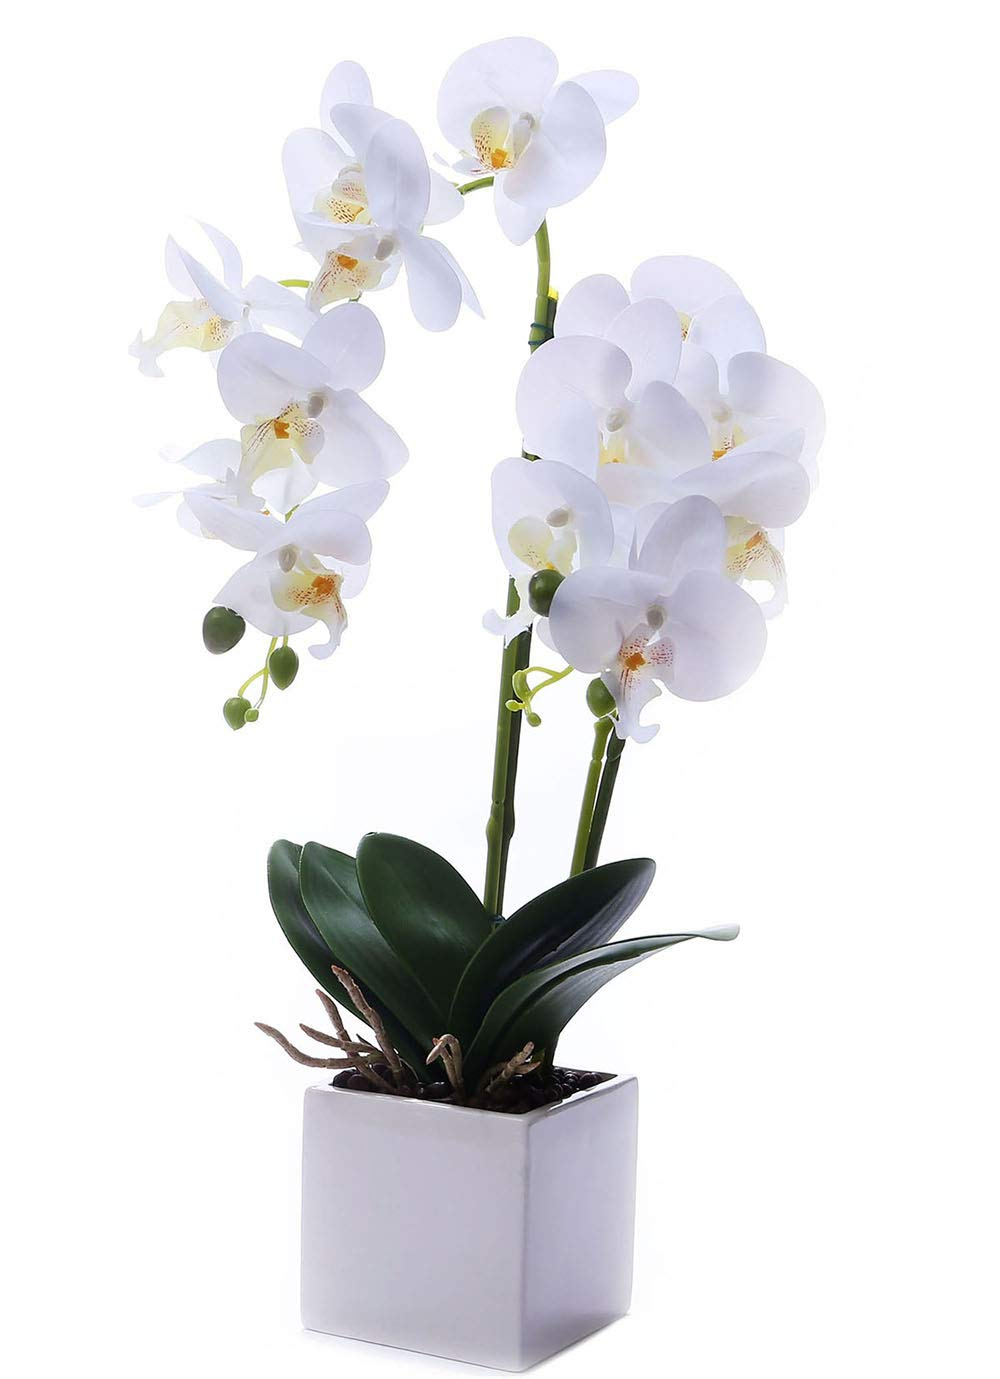 LEEMAN Artificial Lifelike Real Touch Flowers Arrangement Phalaenopsis Bonsai Orchid Miniascape Home Decoration (White 535)